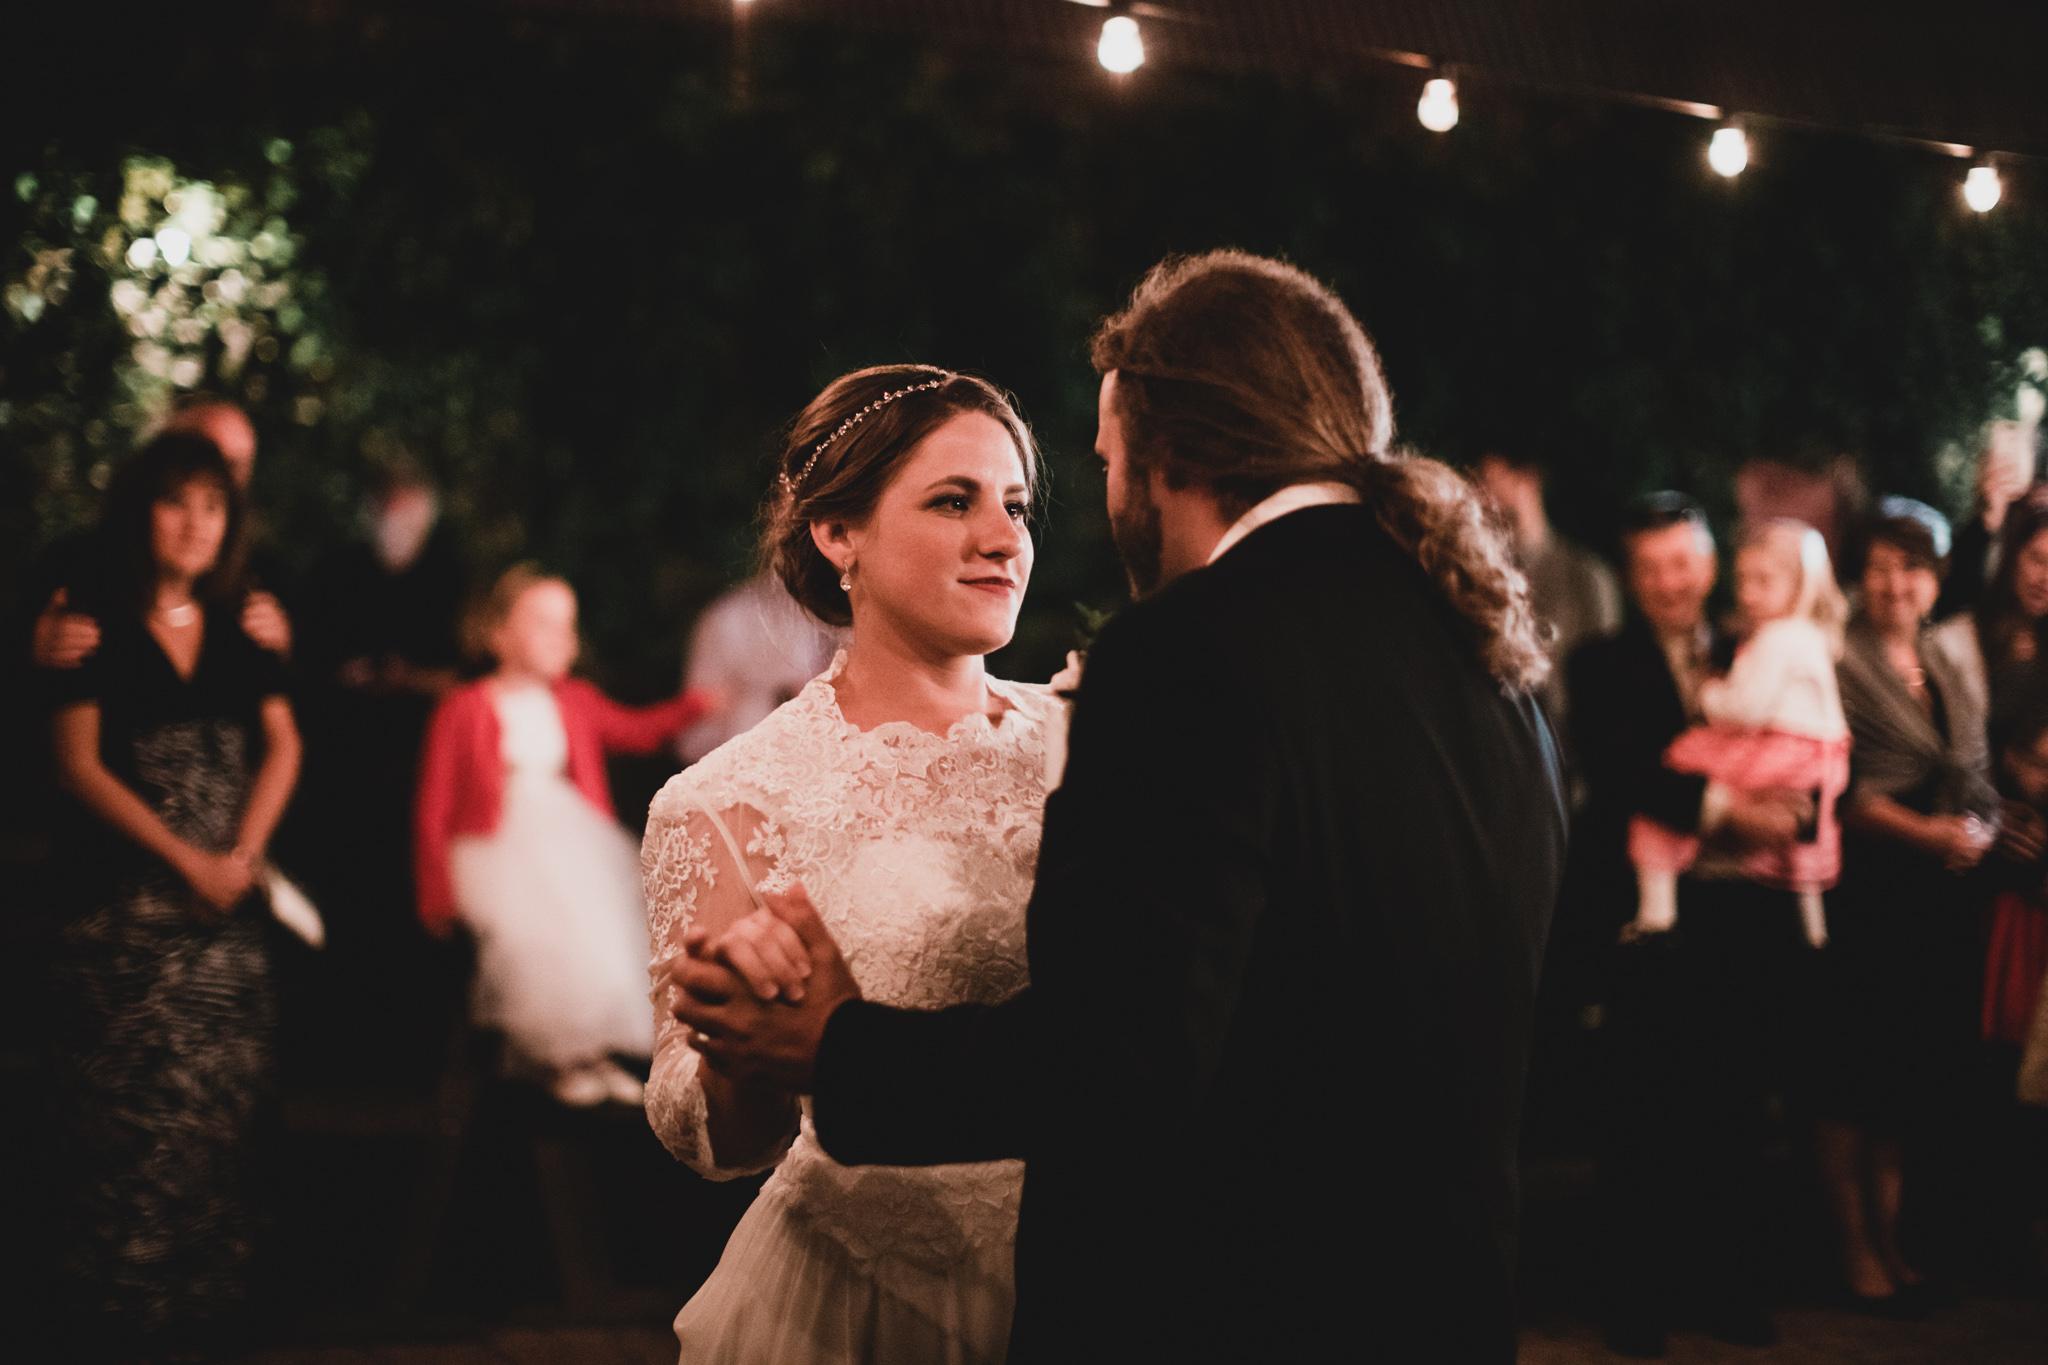 Moody wedding photos Ottawa